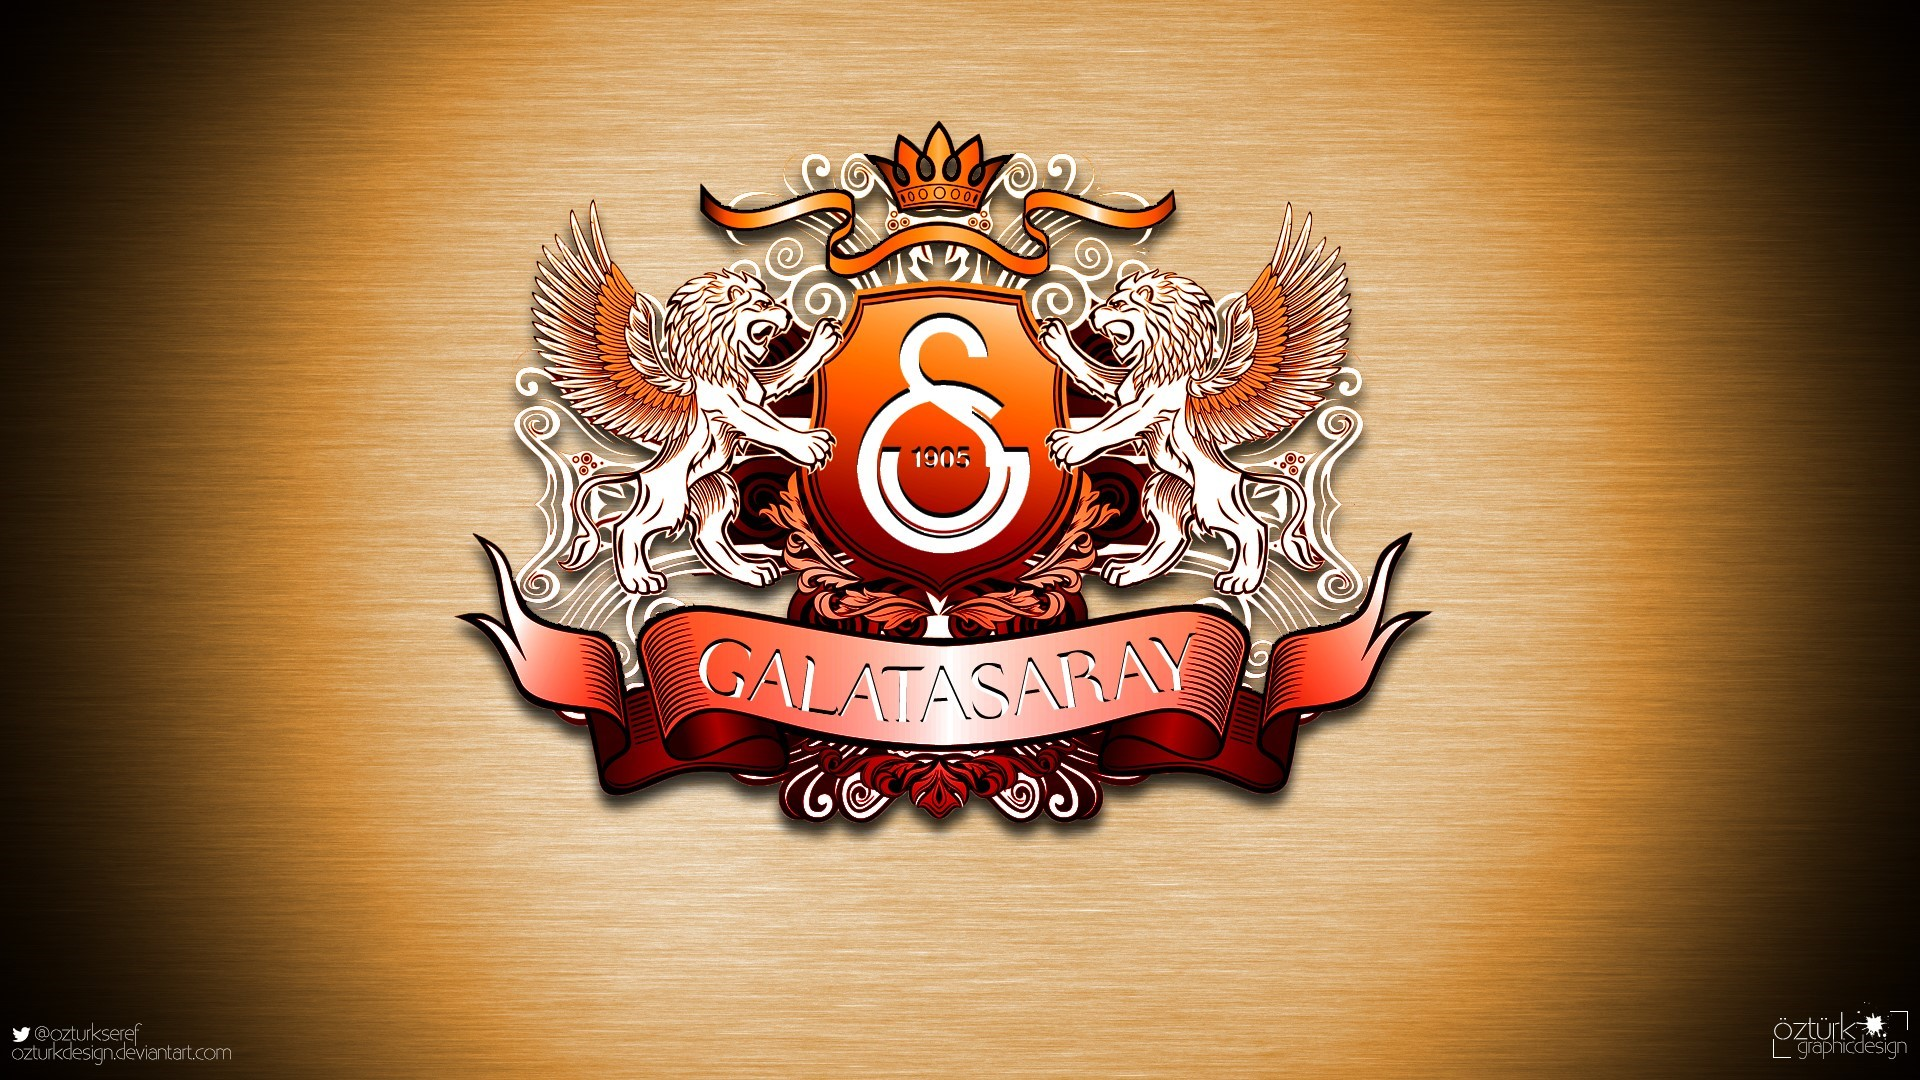 Galatasaray Logoları